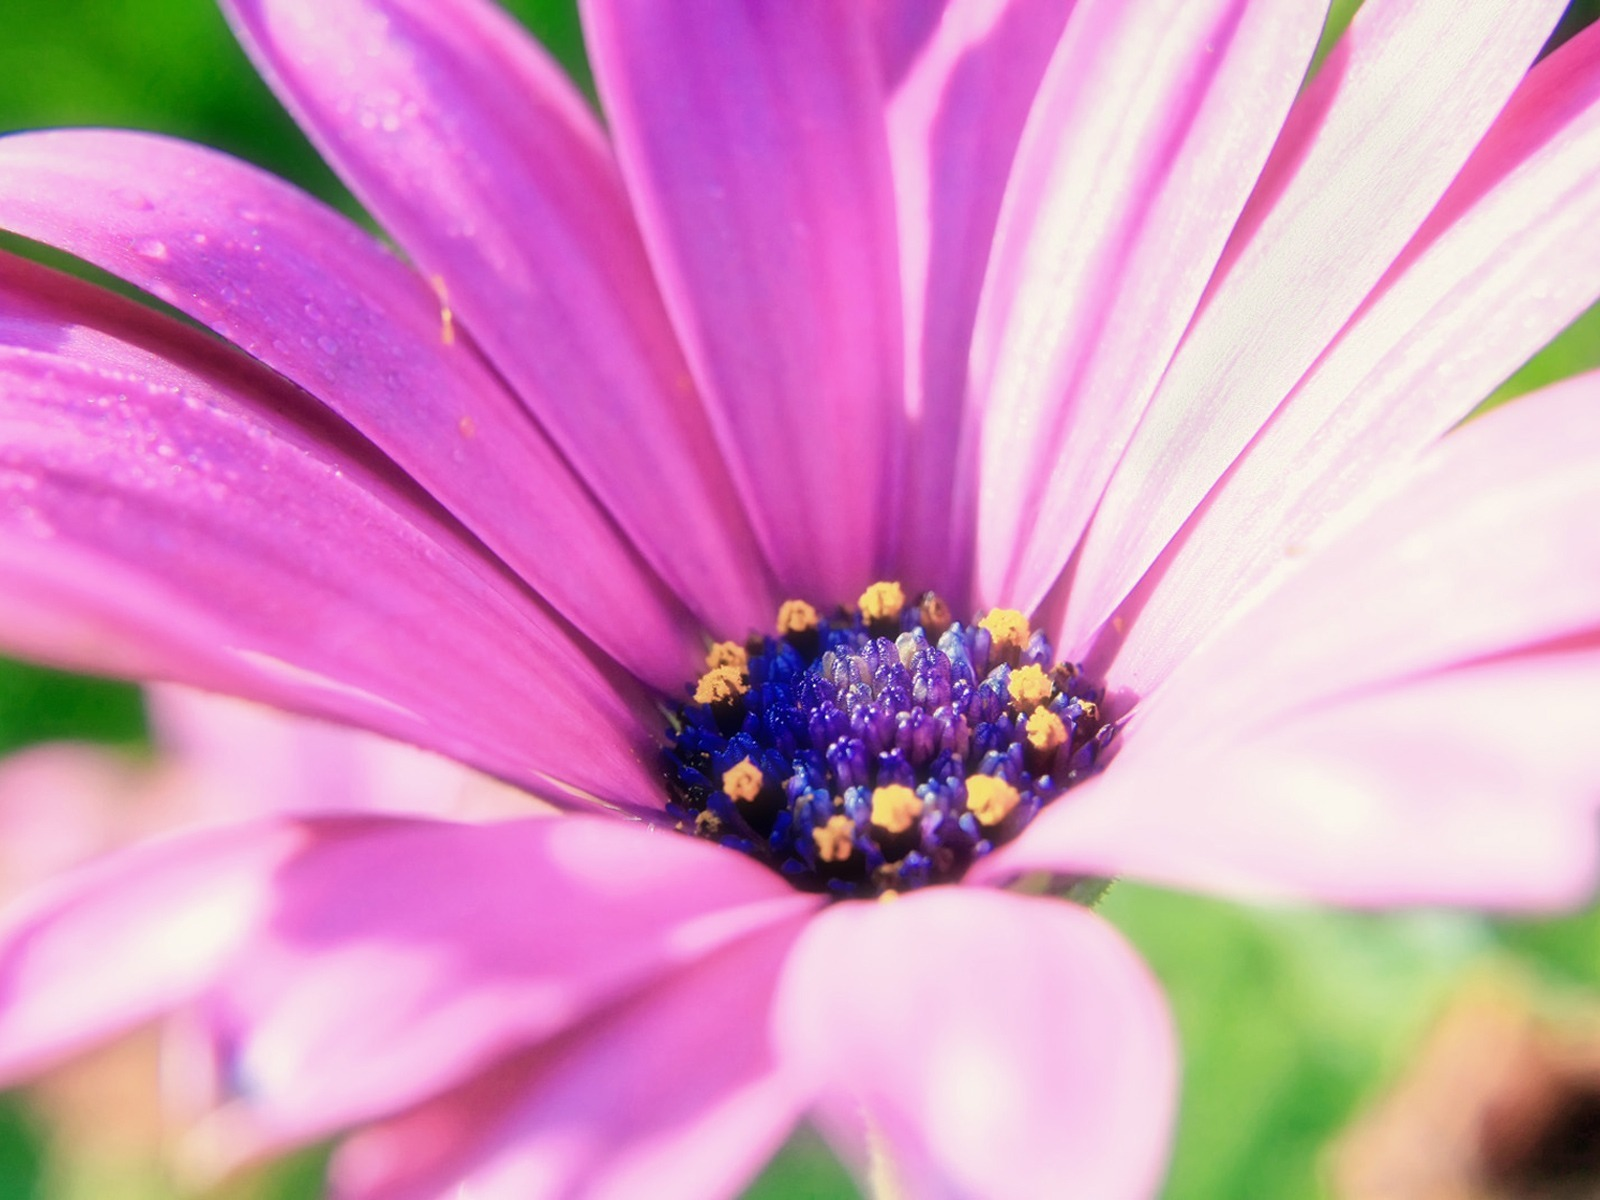 http://2.bp.blogspot.com/-KdcbPzWWA8E/Taitj7C80iI/AAAAAAAAGhA/846i7Id8Jy8/s1600/113_size_1600x1200_pink-flower-1600-1200-3605.jpg